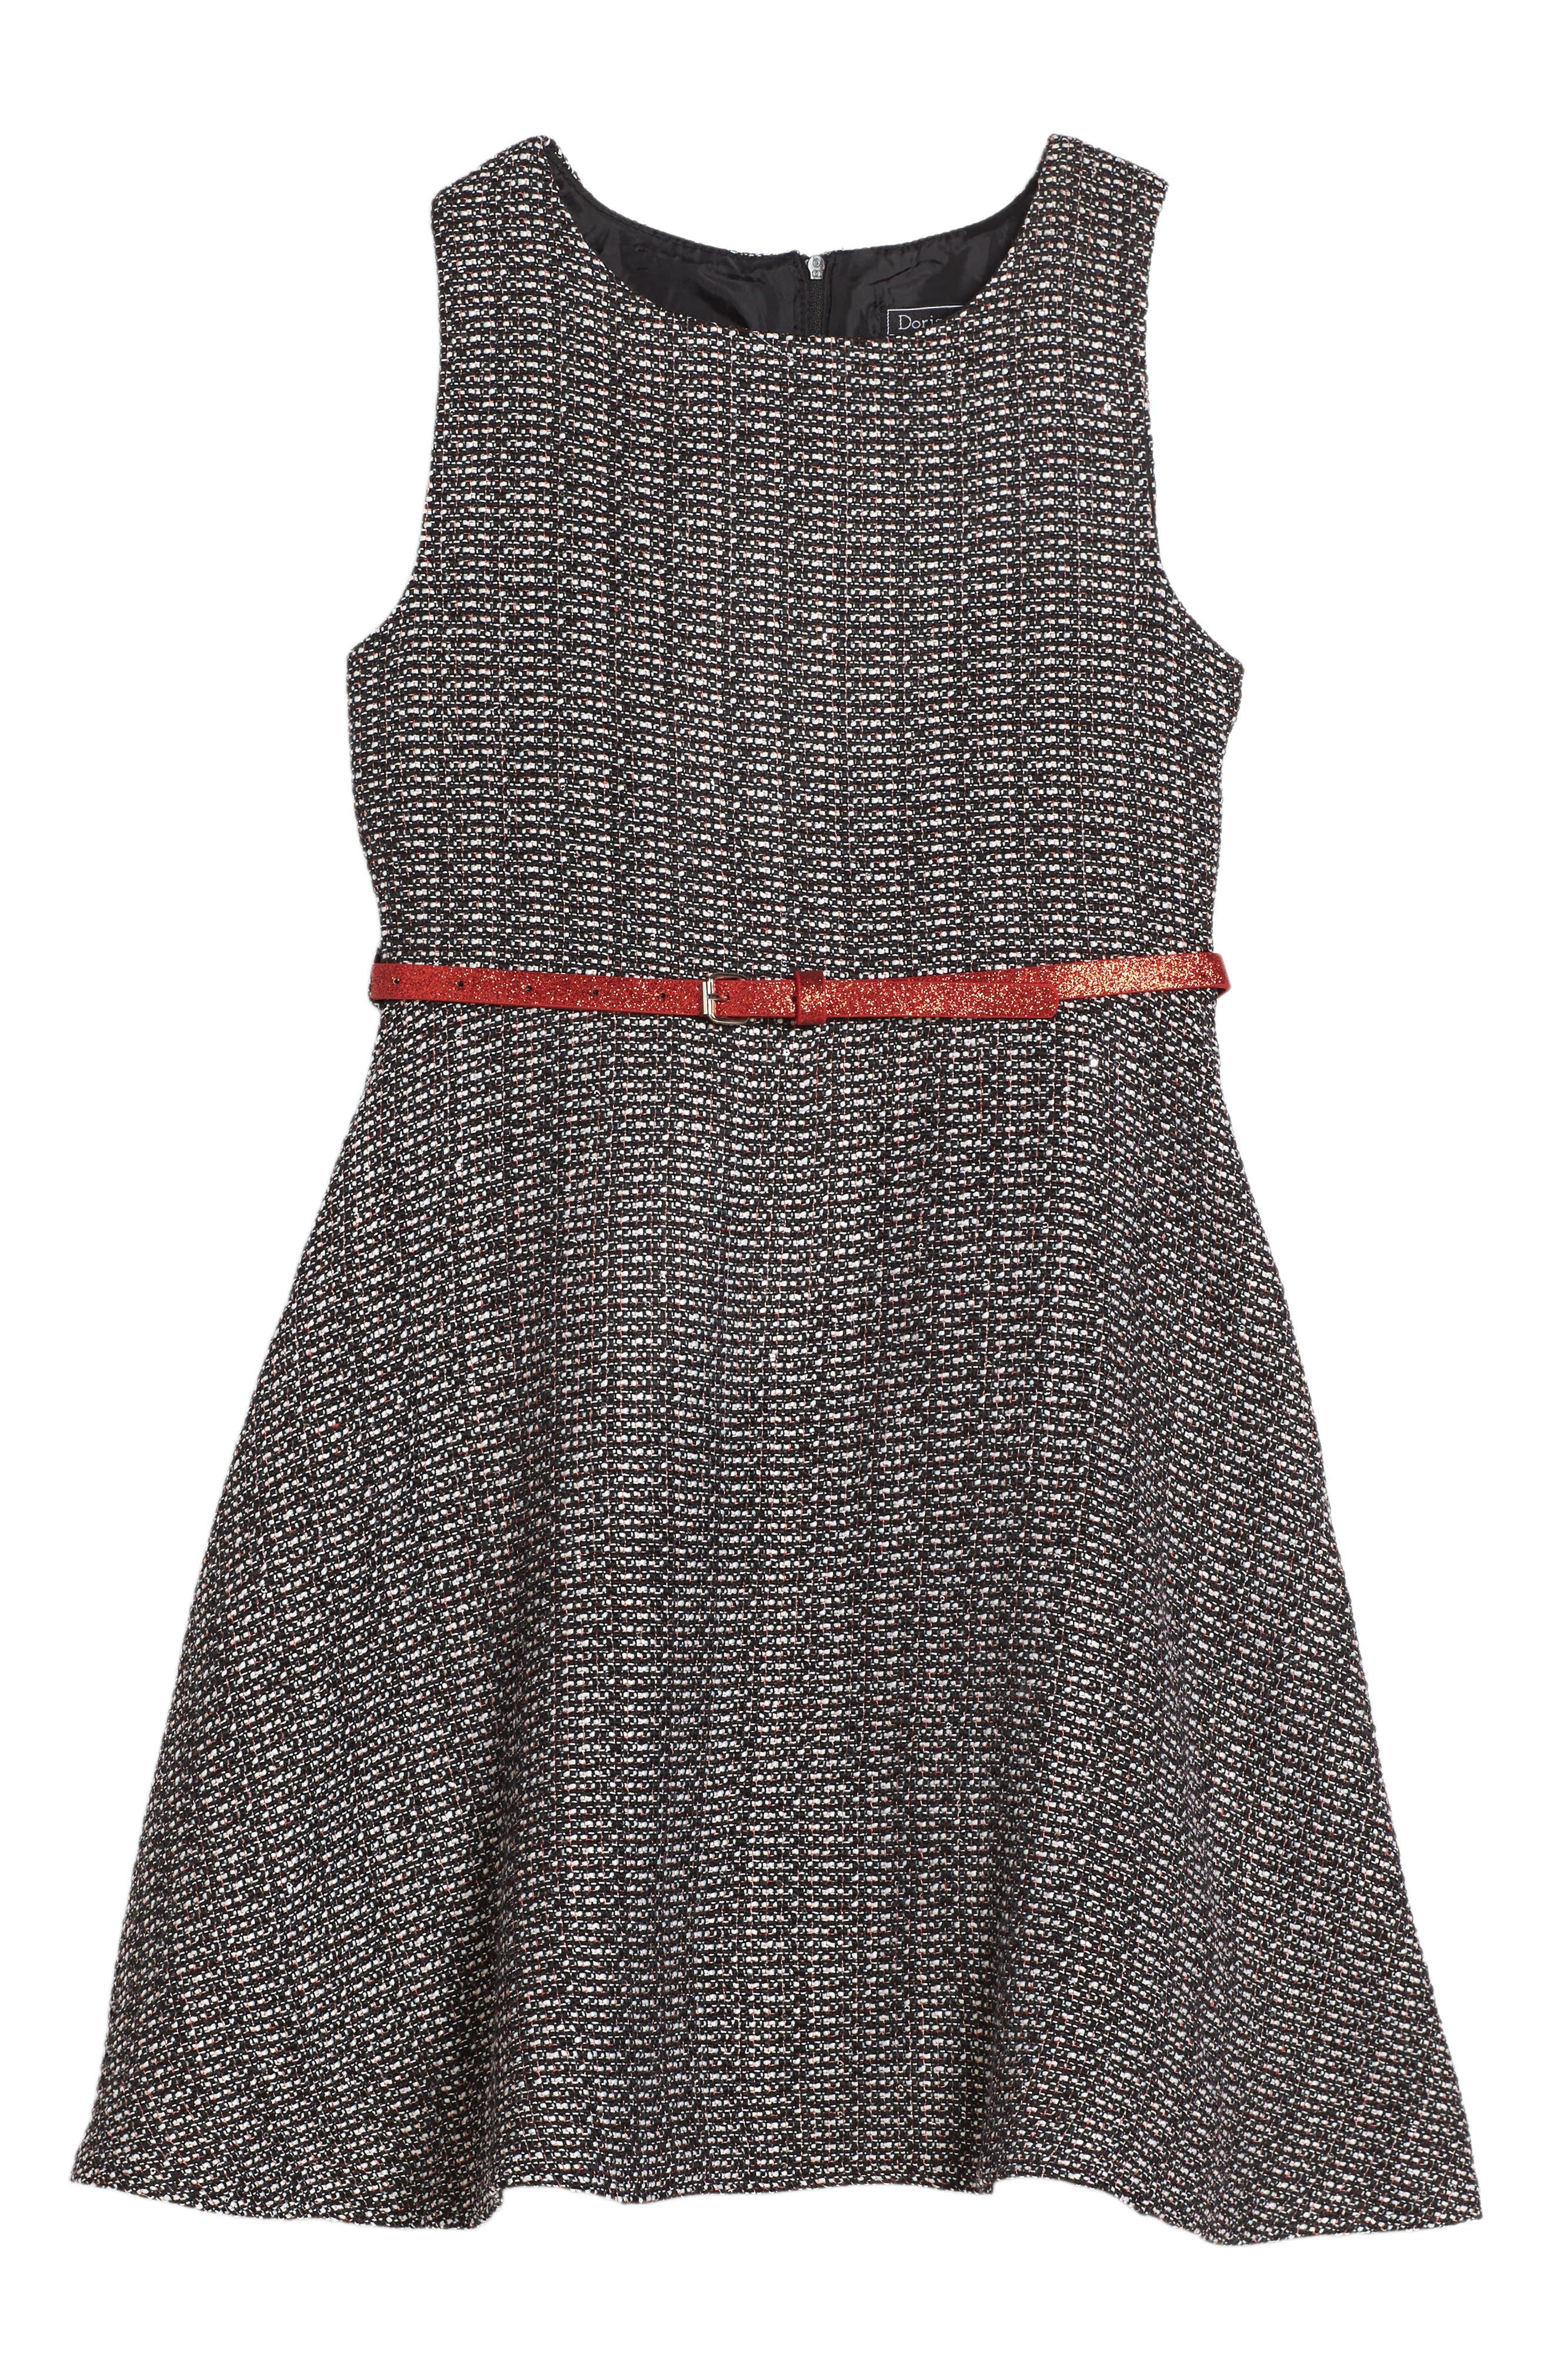 Alternate Image 1 Selected - Dorissa Ella Tweed Dress (Big Girls)